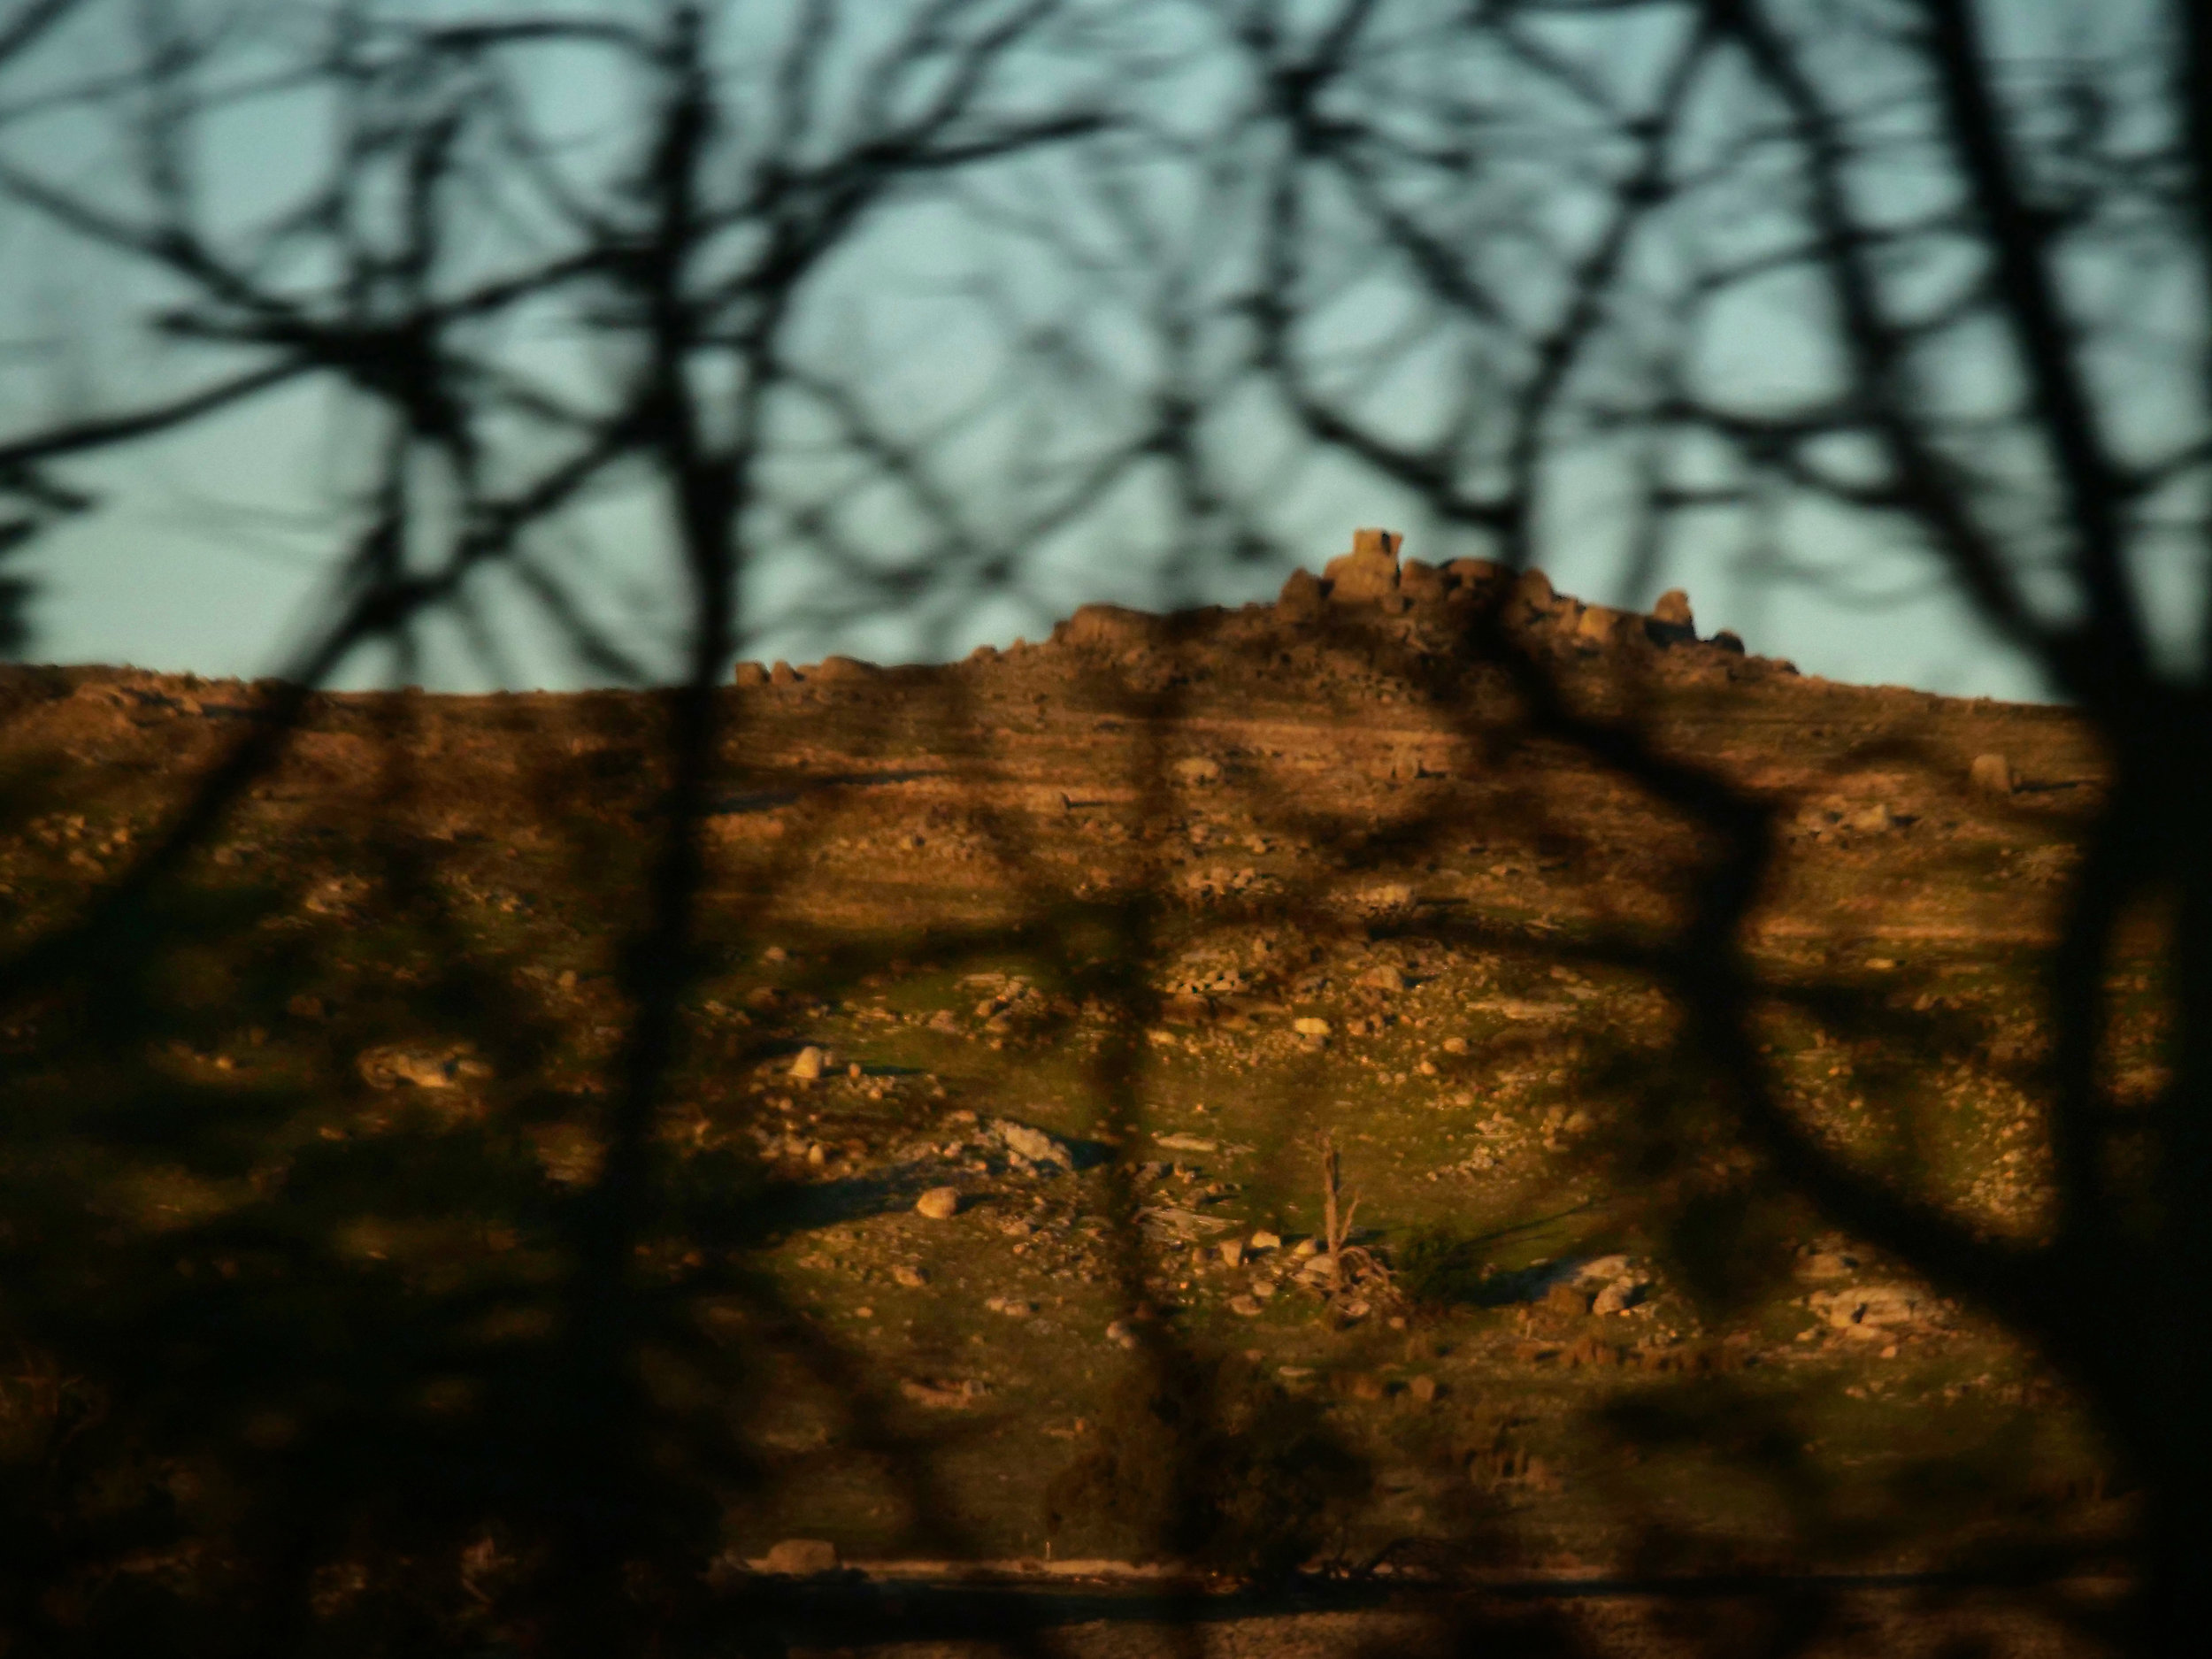 roadside and rocky landscape.jpg